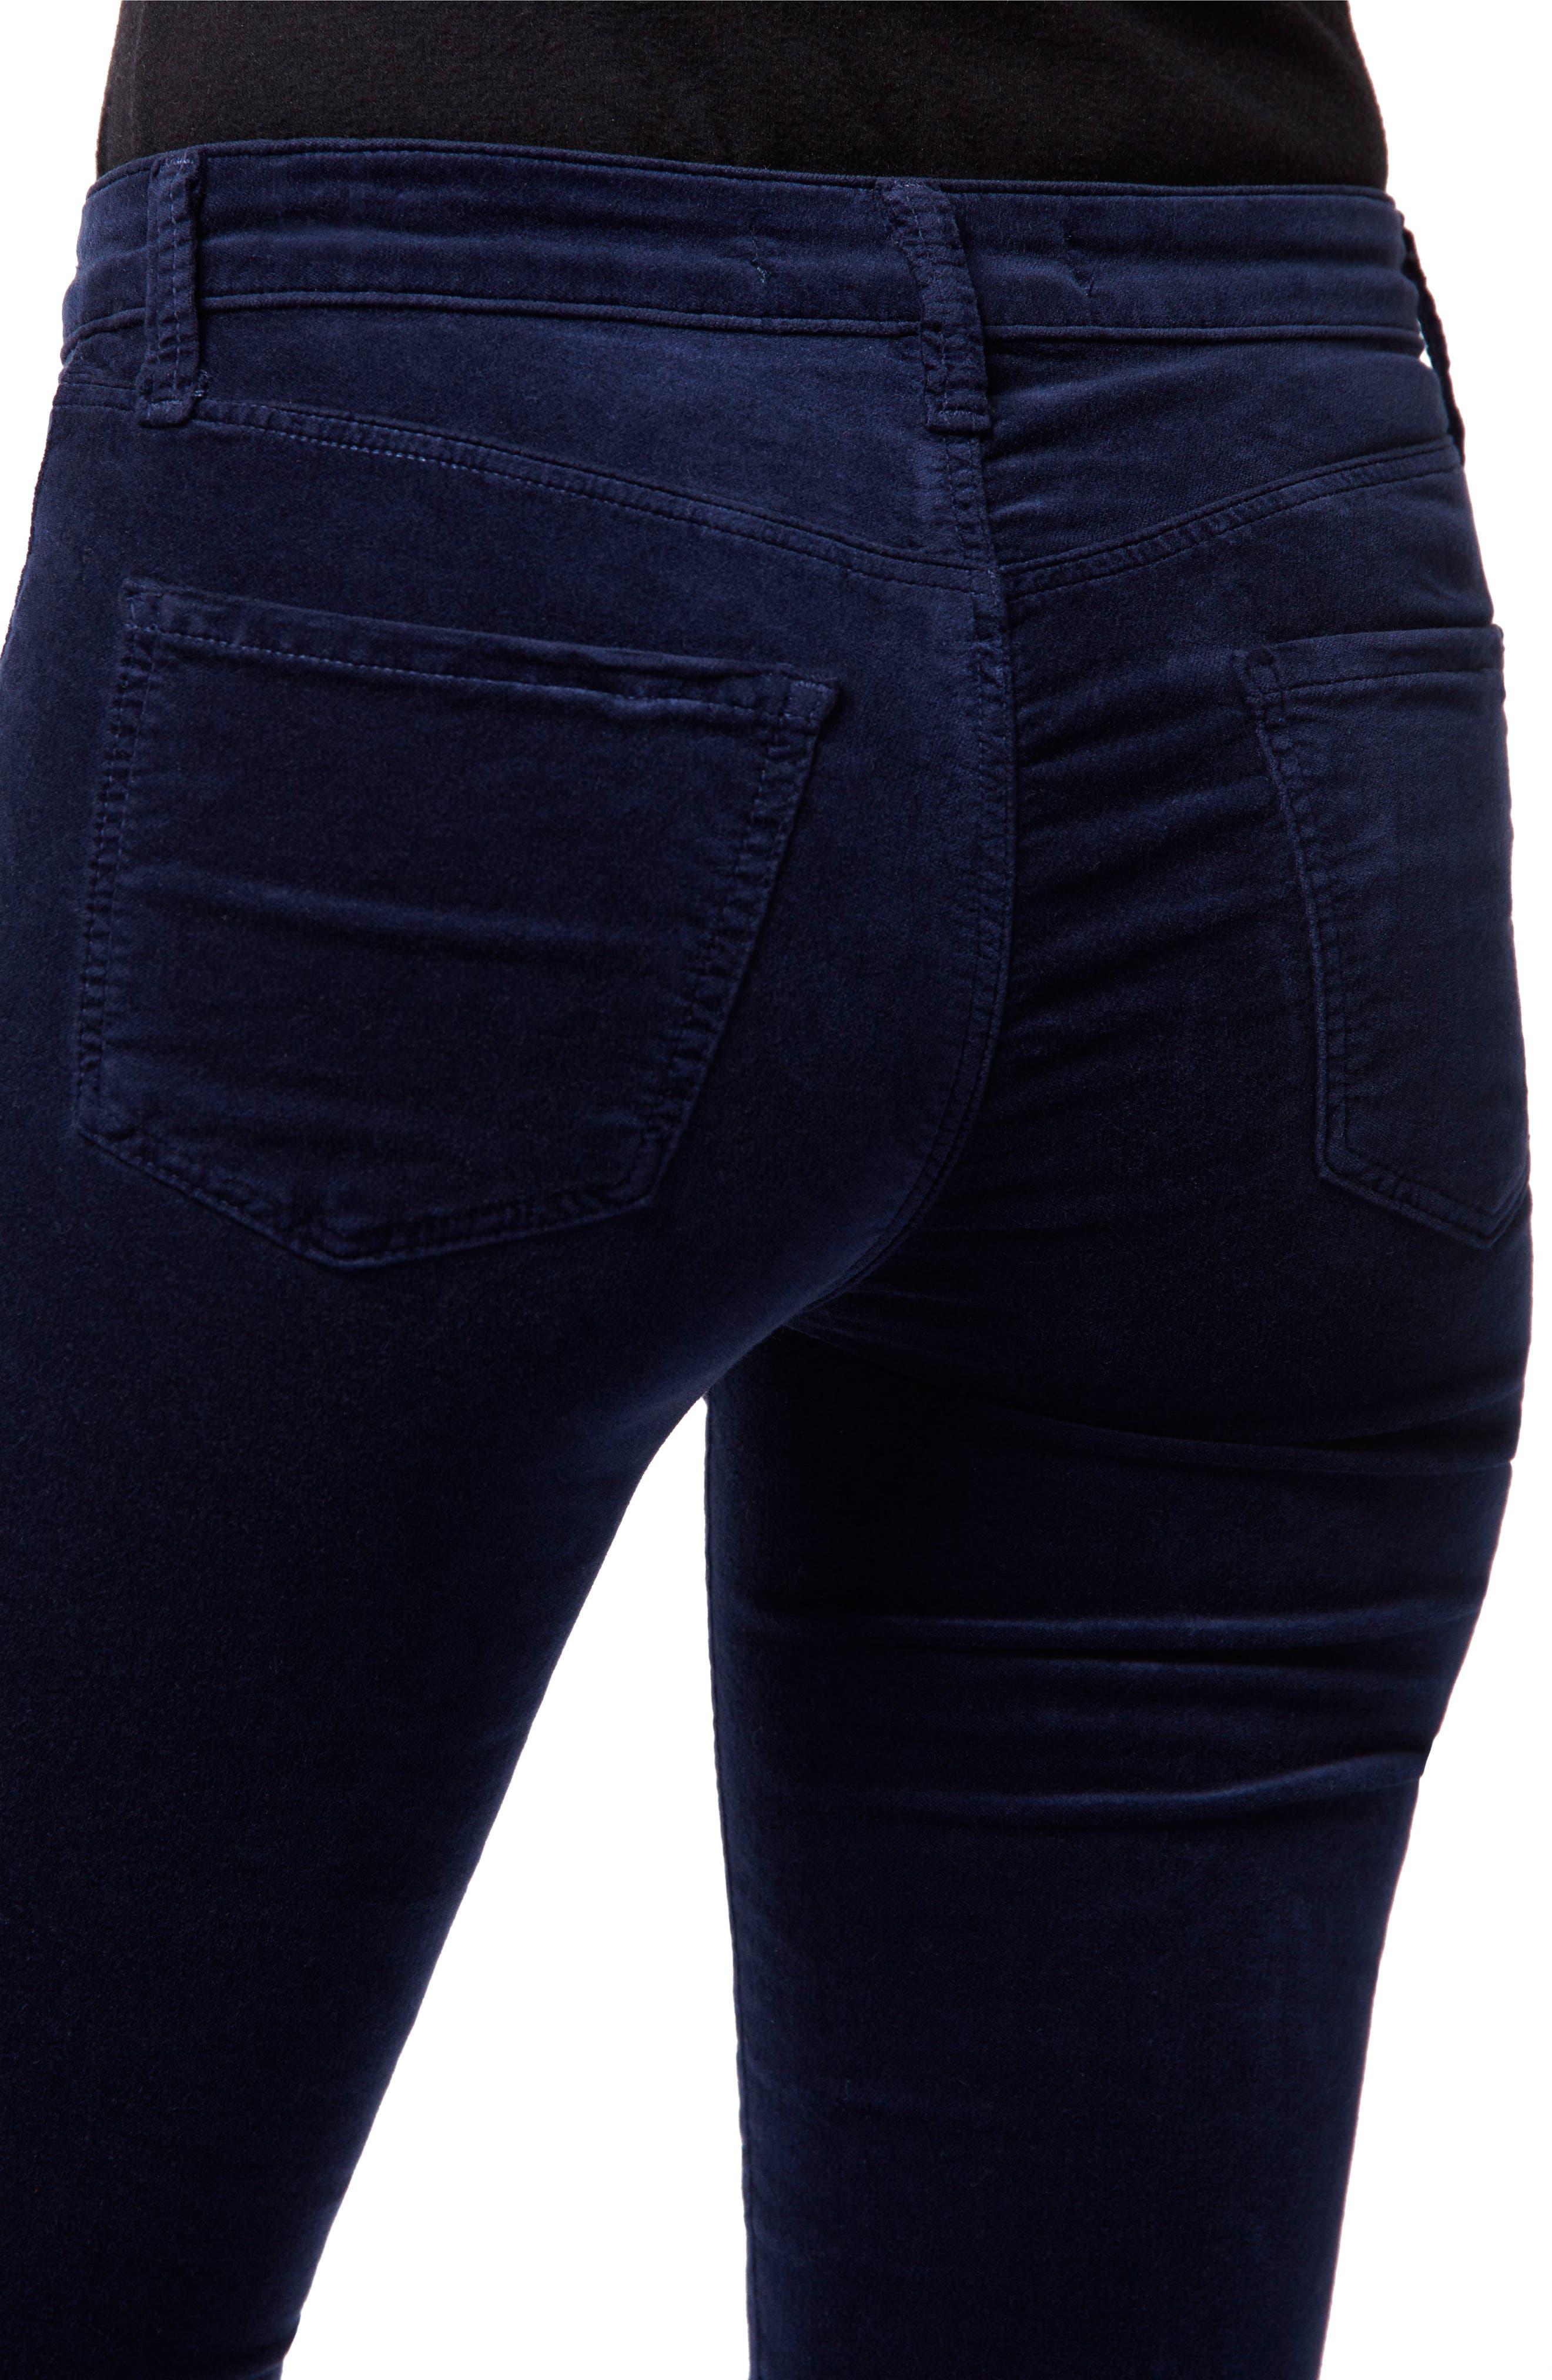 Maria High Waist Velvet Skinny Jeans,                             Alternate thumbnail 4, color,                             NIGHT OUT